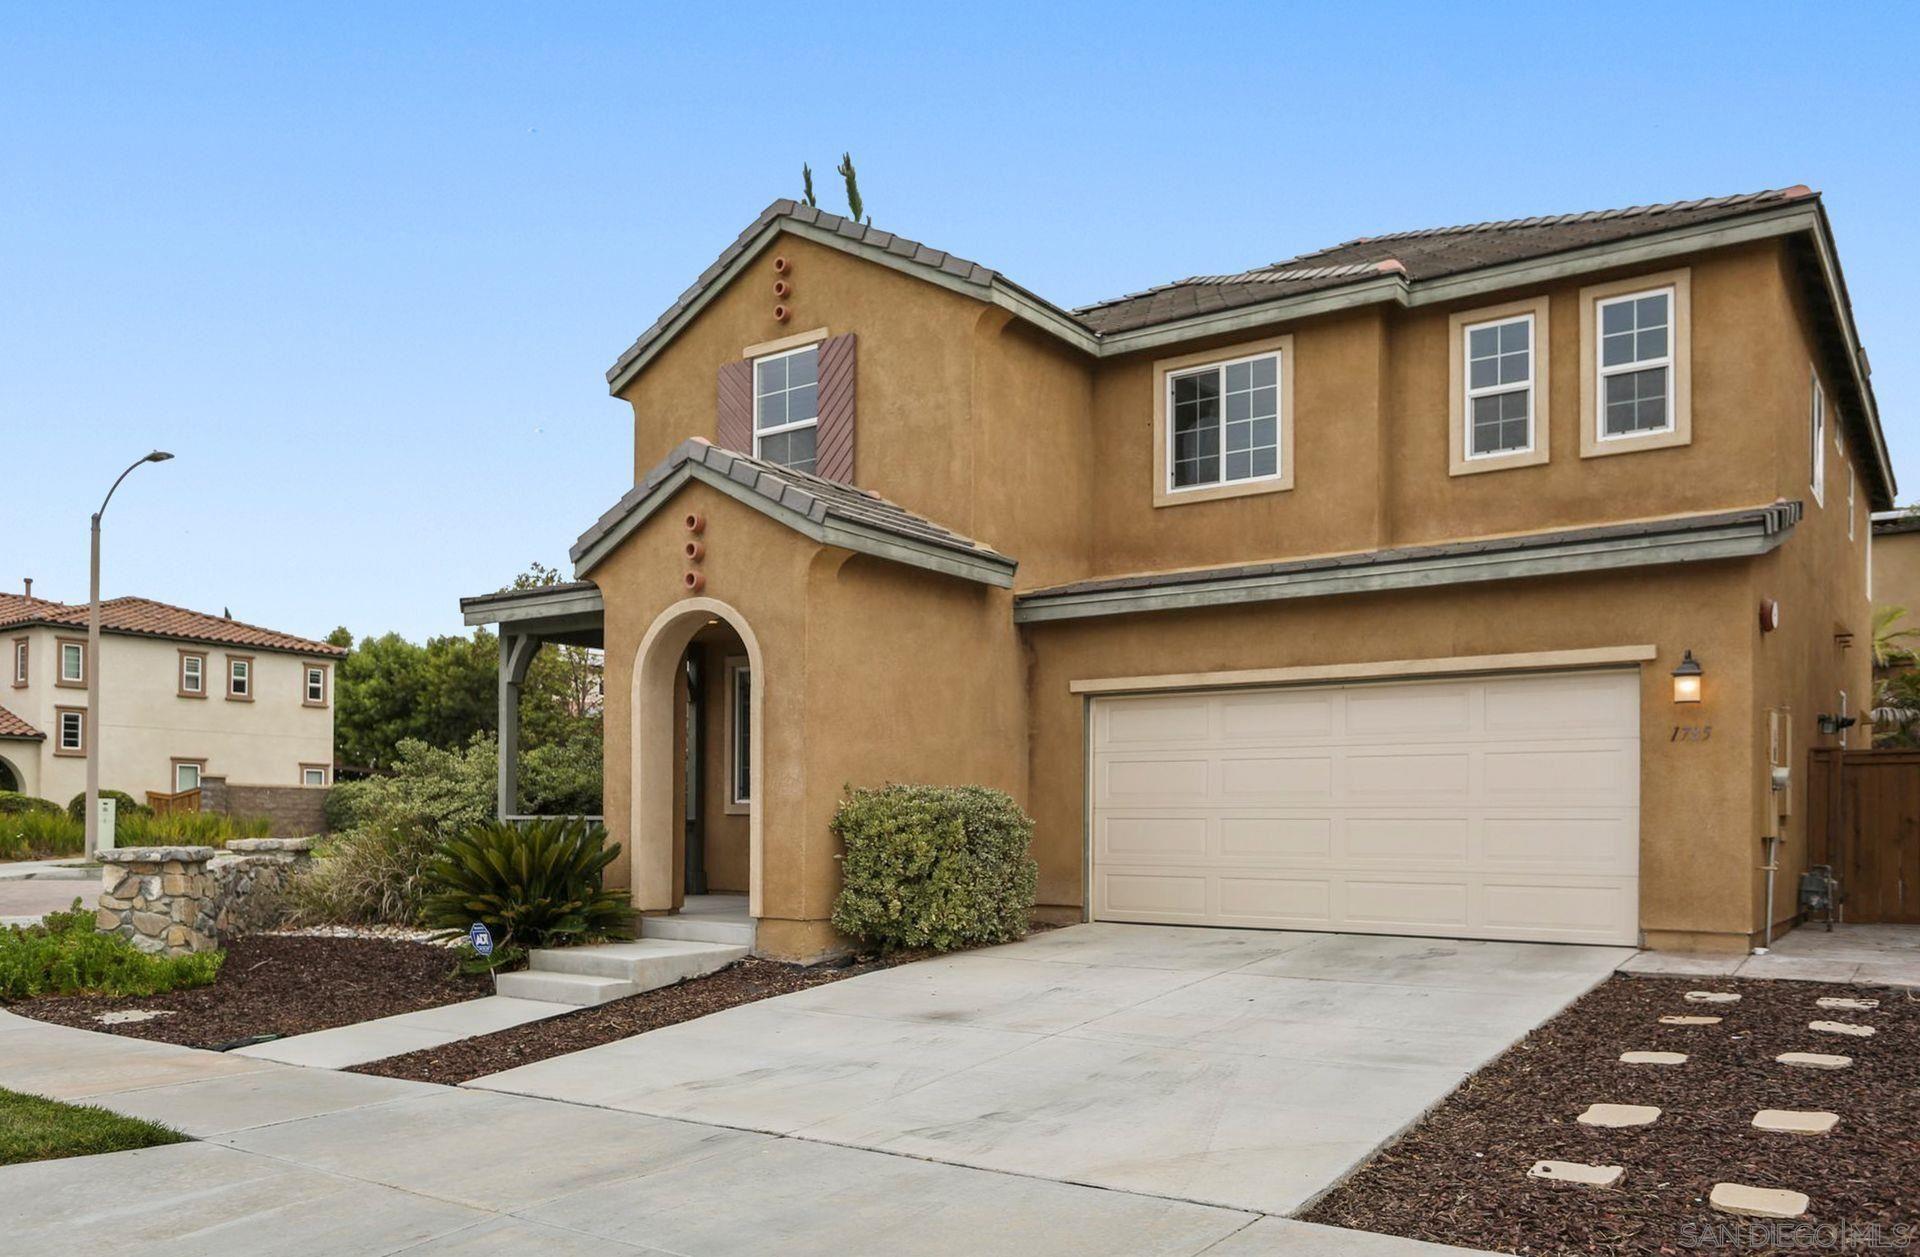 Photo of 1785 Jackson St, Chula Vista, CA 91913 (MLS # 210026493)